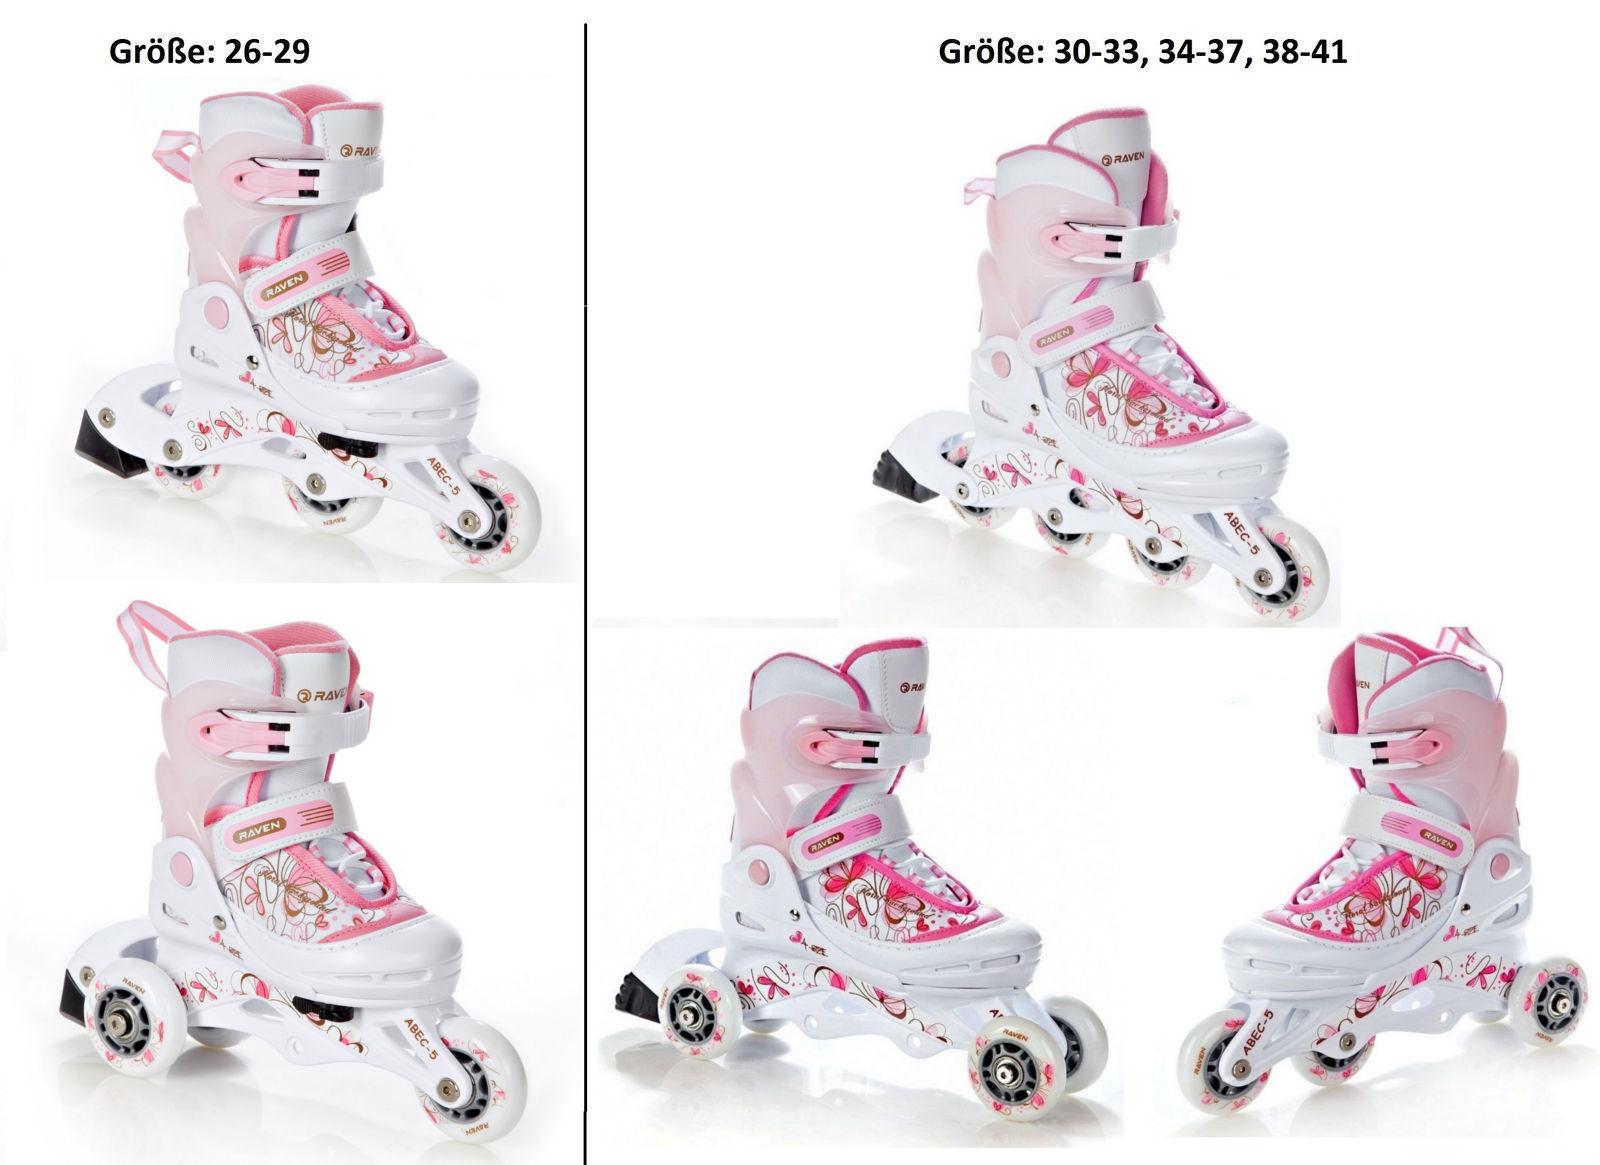 2in1 3in1 Inlineskates Inliner Triskates Rollschuhe Rollschuhe Rollschuhe + Helm + Schützer - Neu    König der Quantität  c9e37f